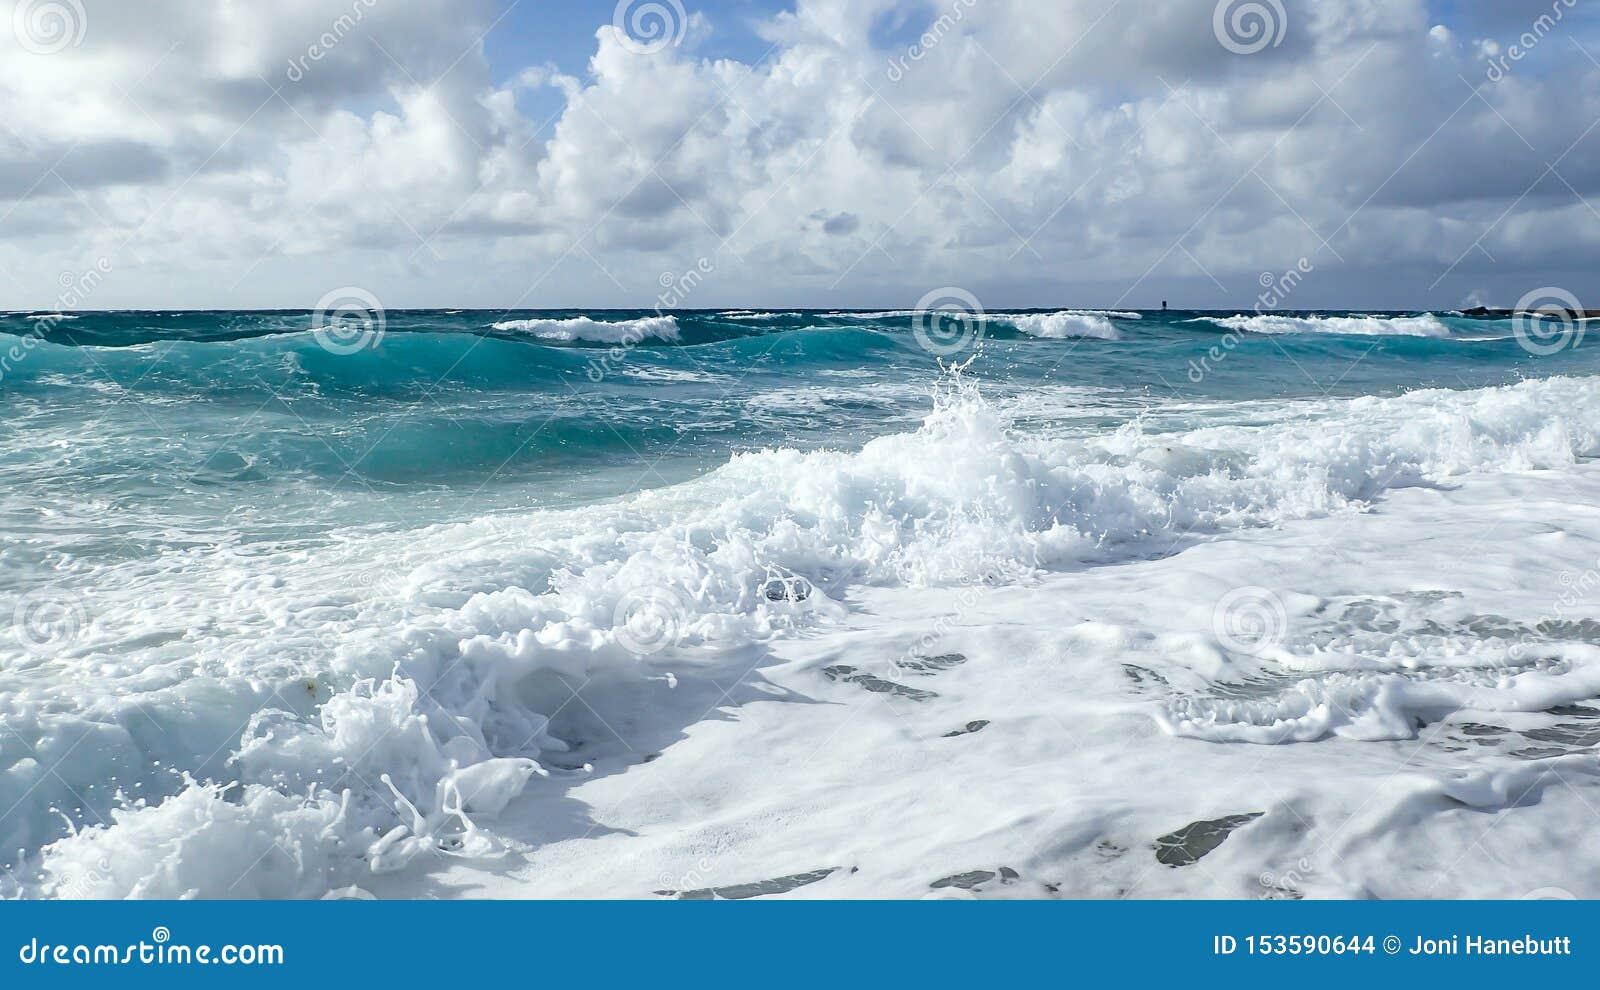 Waves in Florida on the Atlantic coast